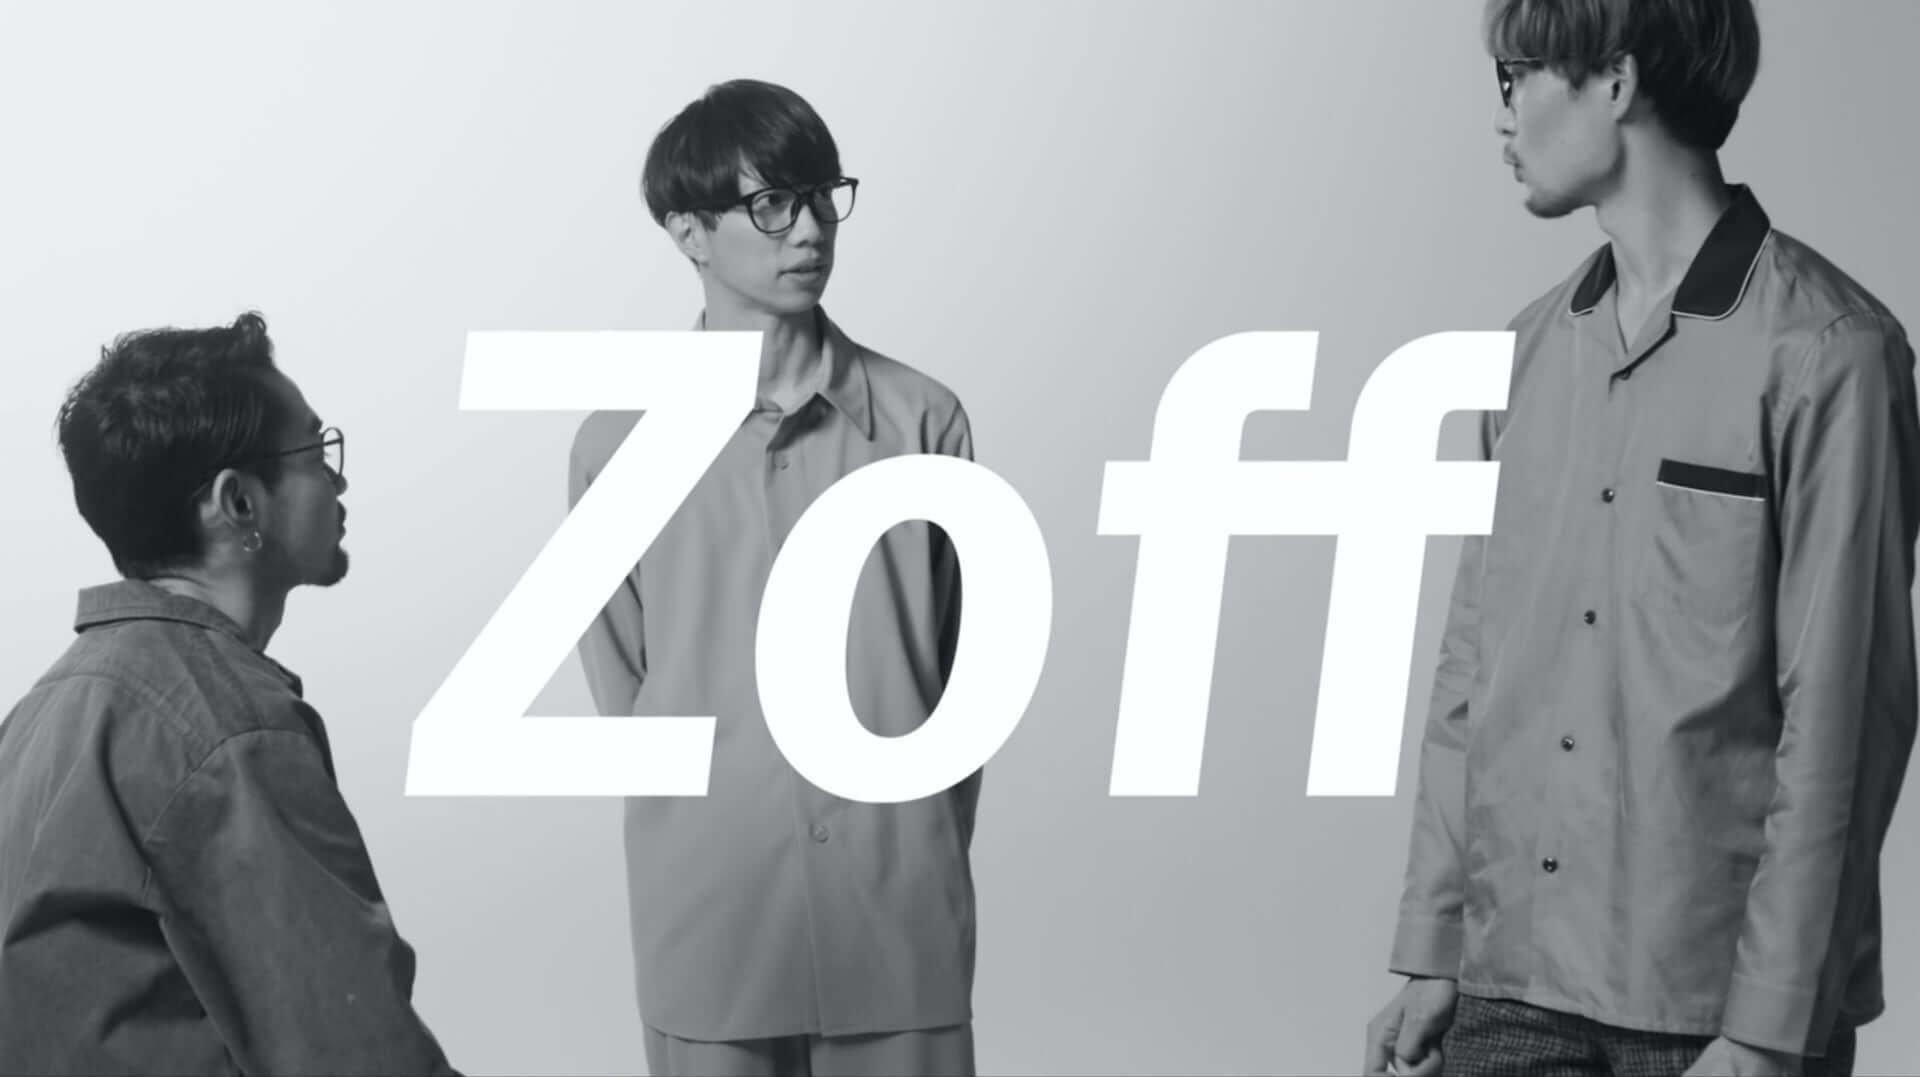 iriとLUCKY TAPESが出演!2WAYグラス『Zoff NIGHT&DAY』のムービーが公開&<Zoff Rock 2020>の開催も決定 music200324_zoff_movie_7-1920x1077